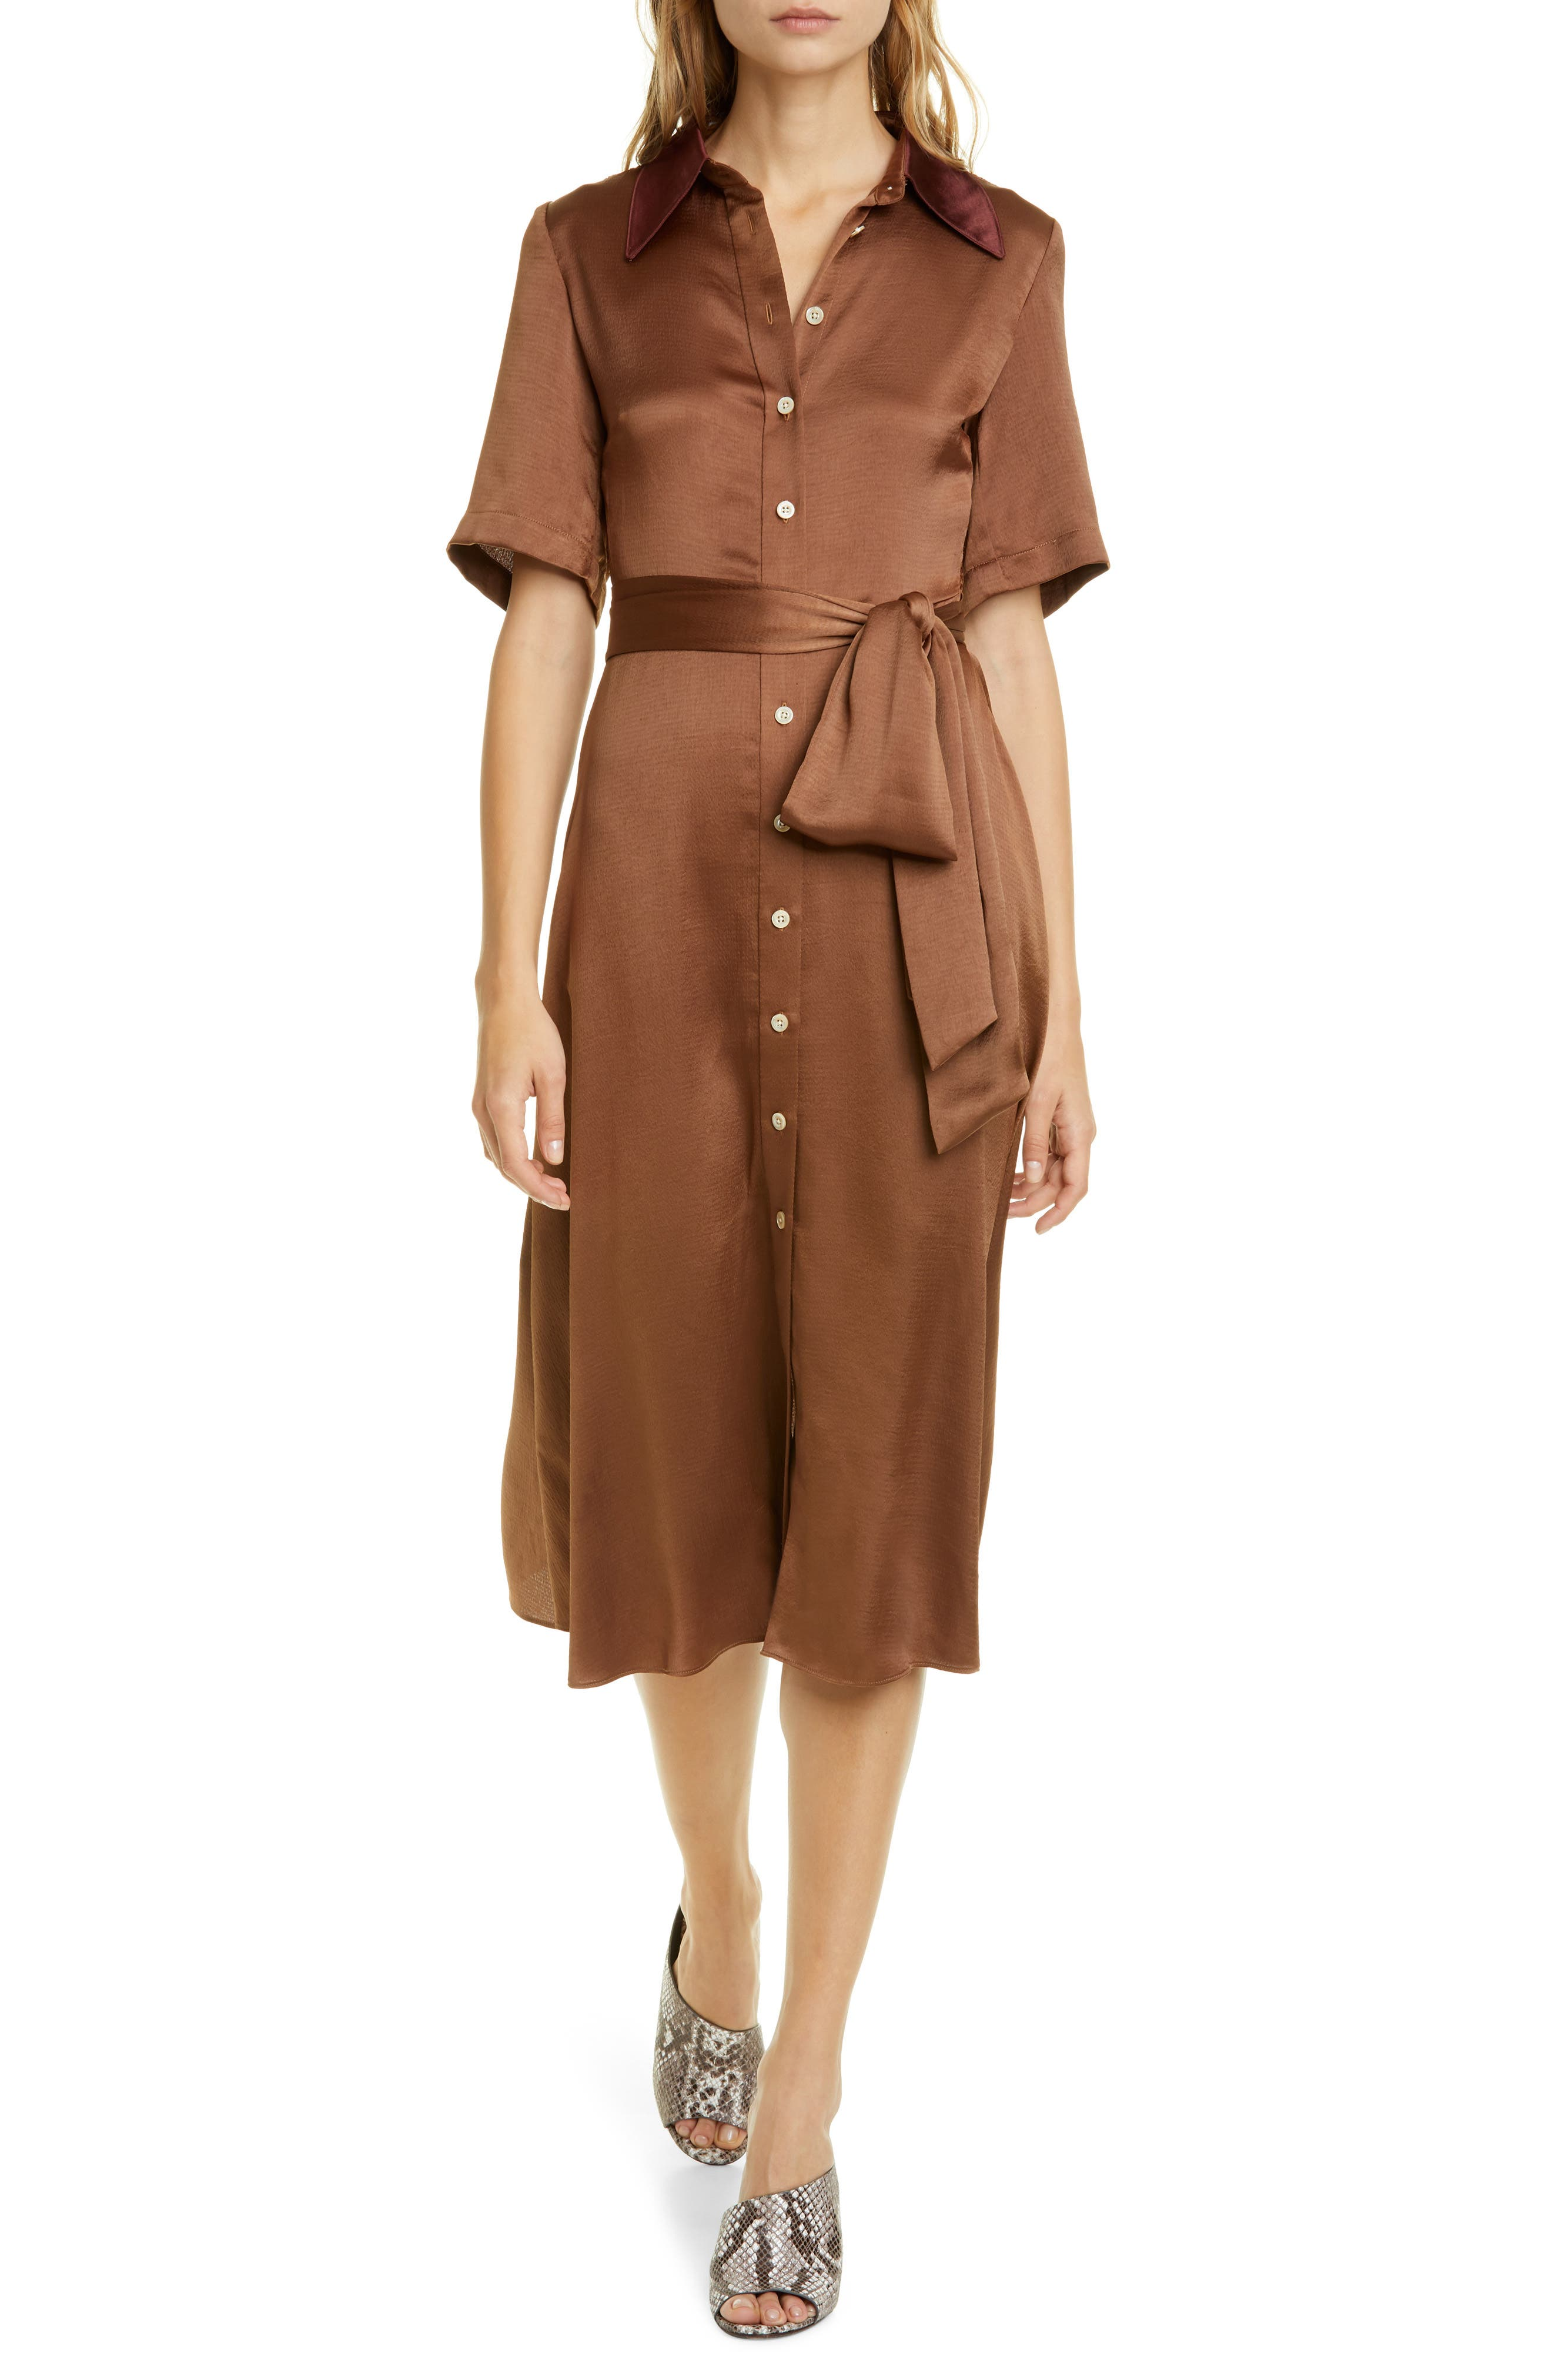 Kate Spade New York Dresses smocked back satin shirtdress